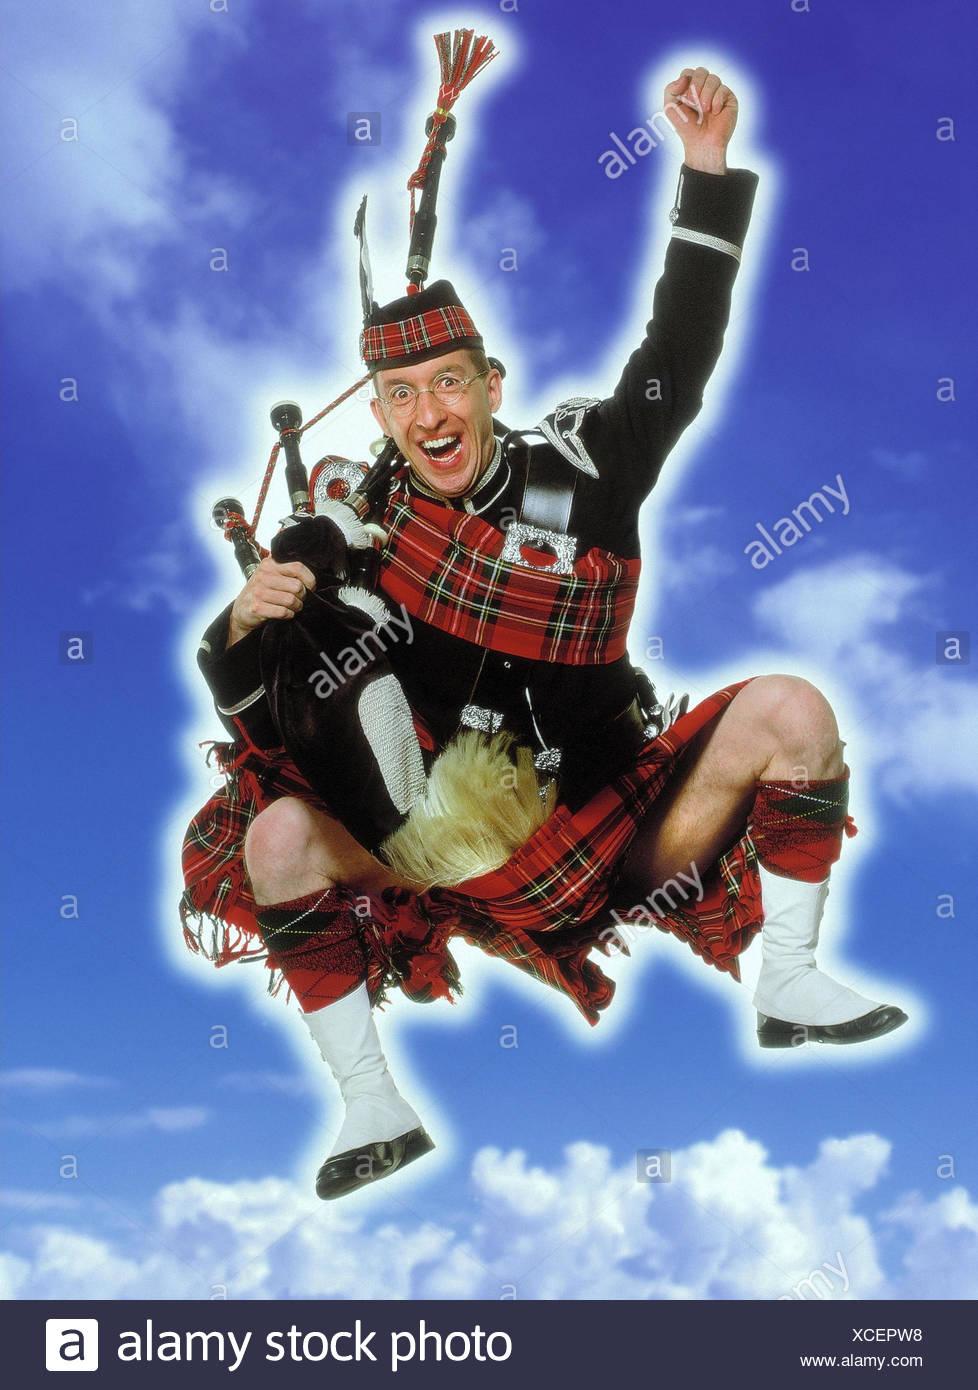 Schotten, Kilt, Dudelsack, Kapern, Geste, Begeisterung, bewölkten Himmel Studio, Mann, Tracht, Kleidung, traditionell, Brille, Jubel, Freude, Erfolg, knacken, springen Stockbild